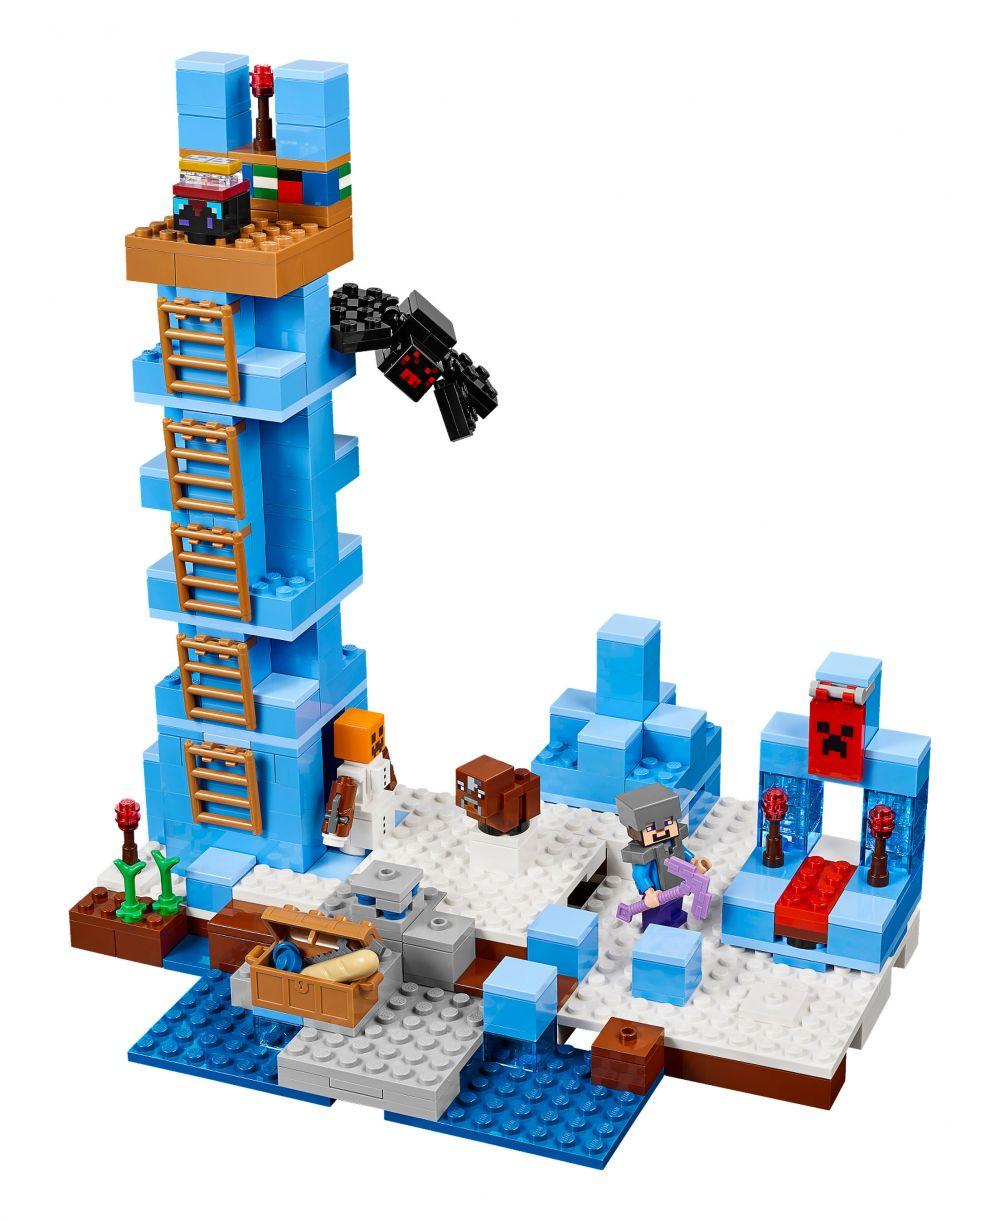 lego minecraft 21131 pas cher les pics de glace. Black Bedroom Furniture Sets. Home Design Ideas